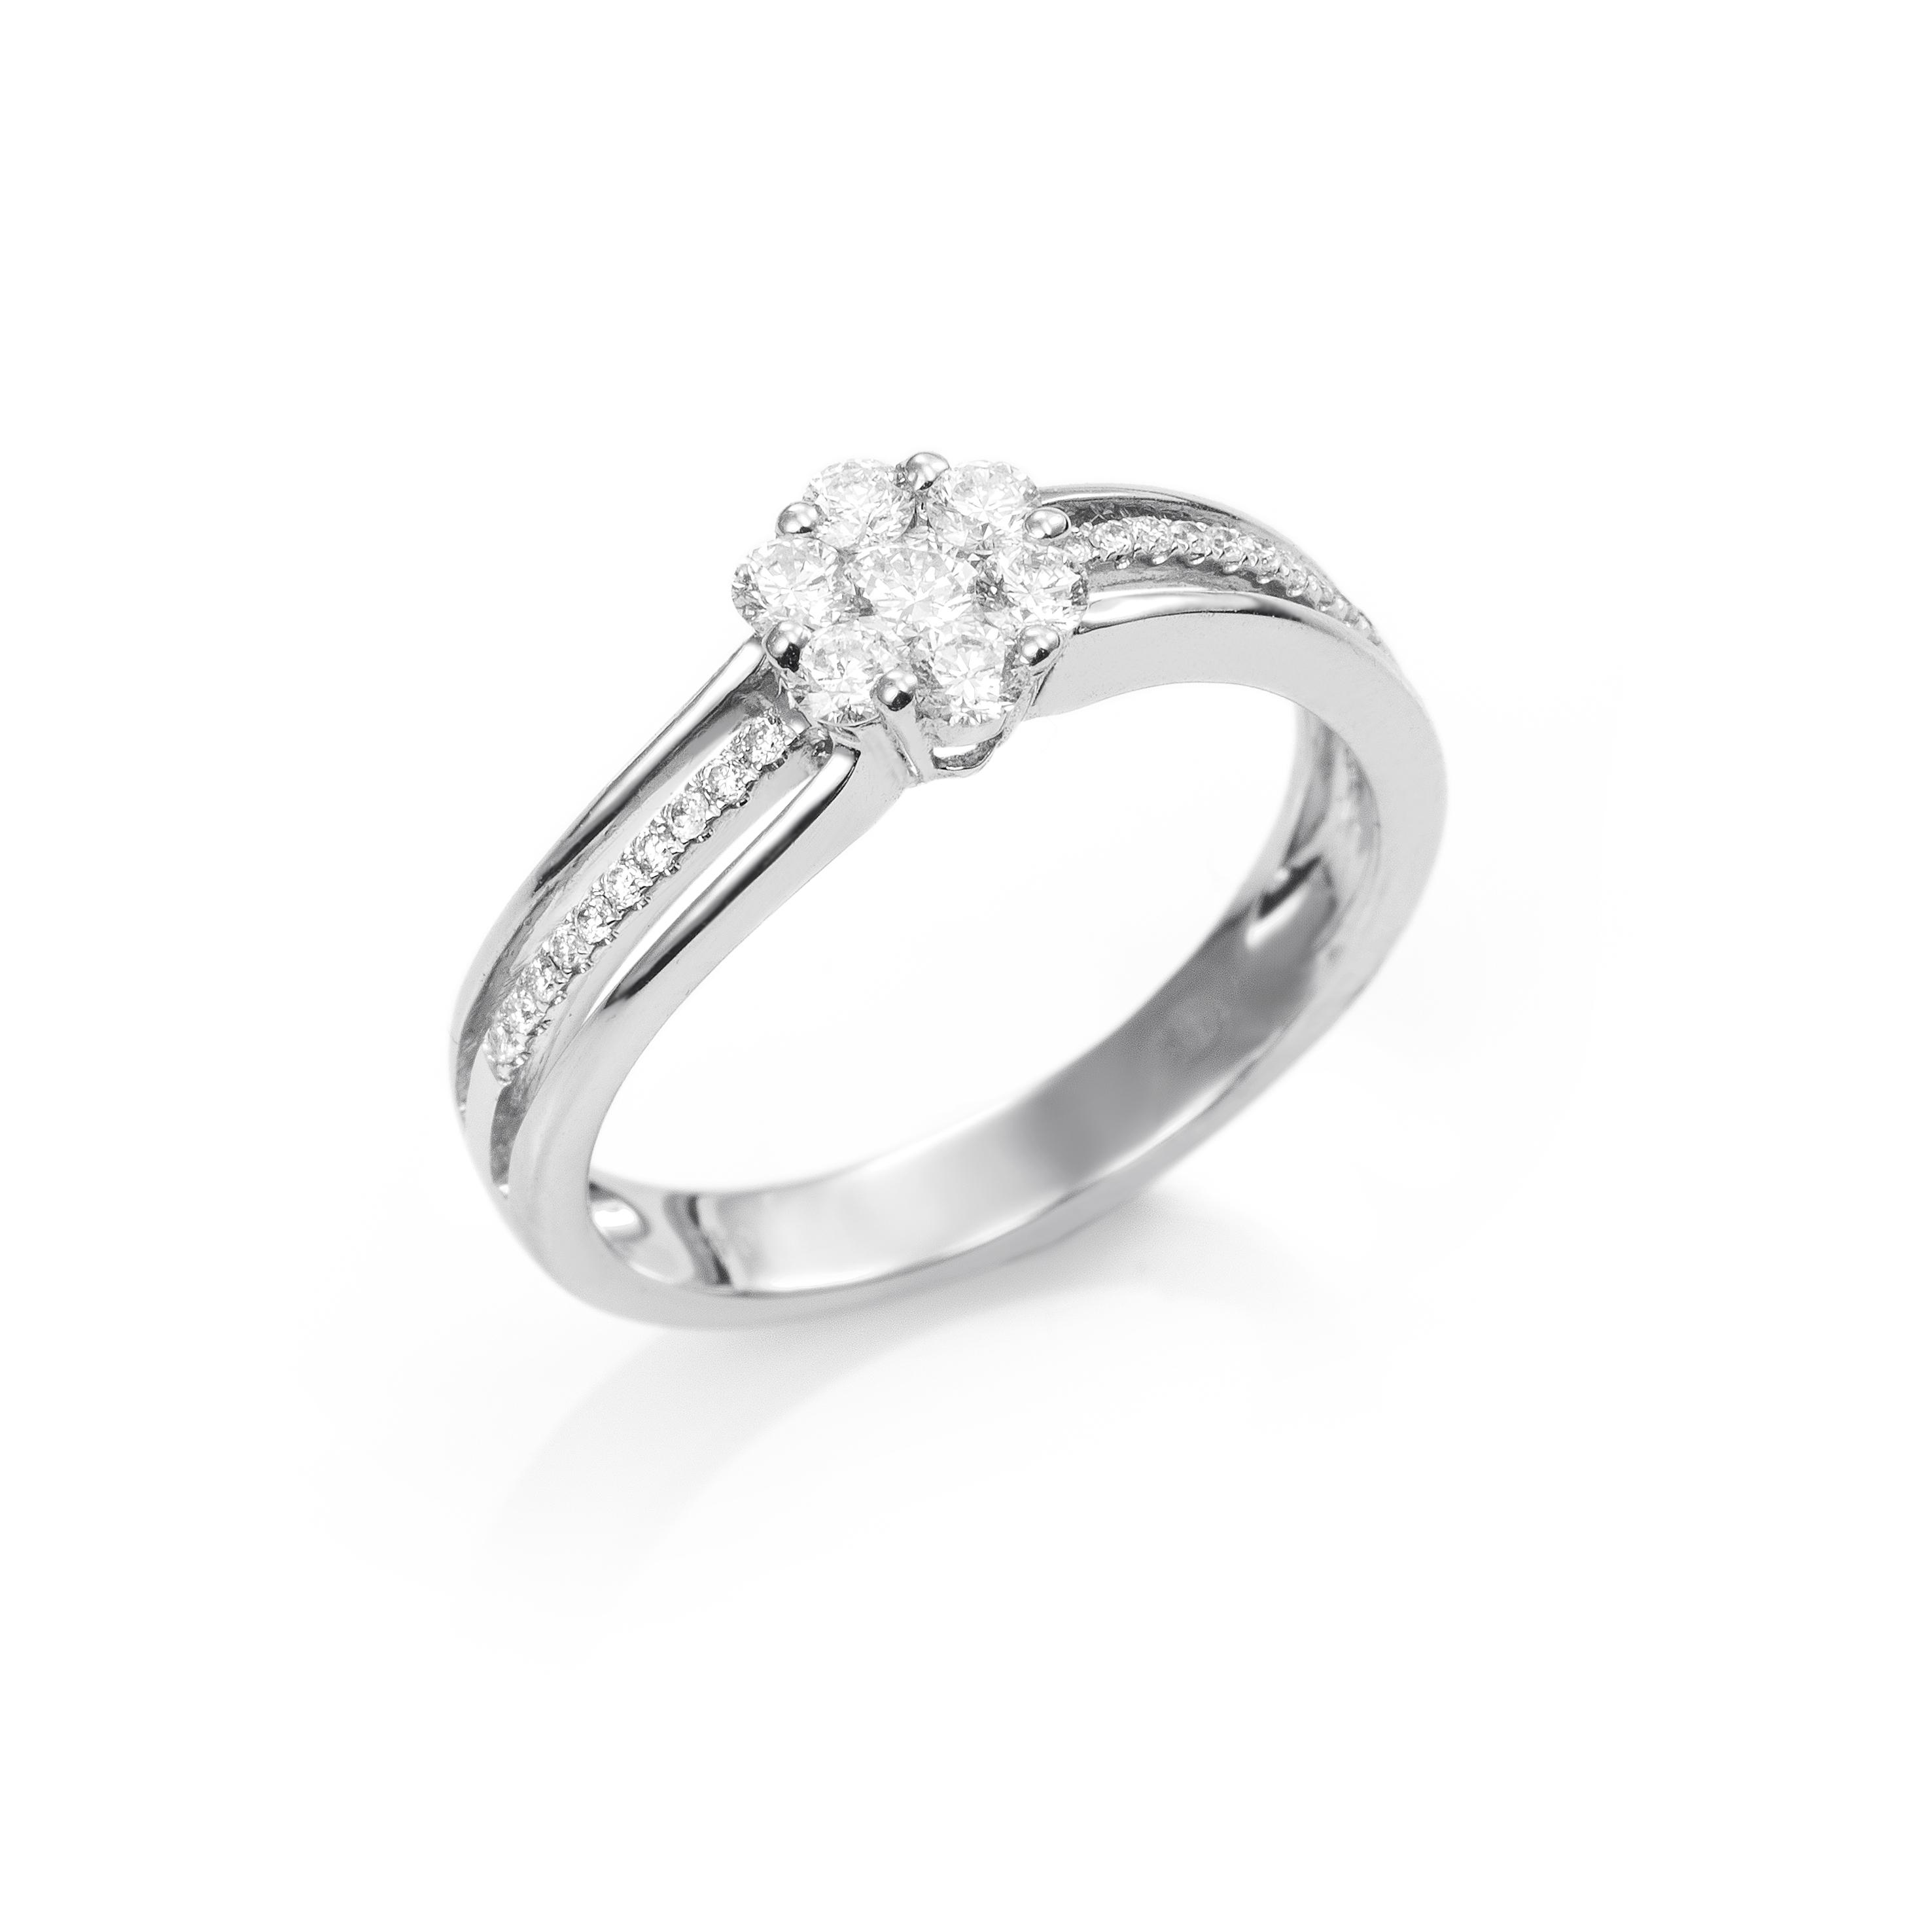 268edf799526 Anillo Oro blanco con Diamantes - Girbes Joyas